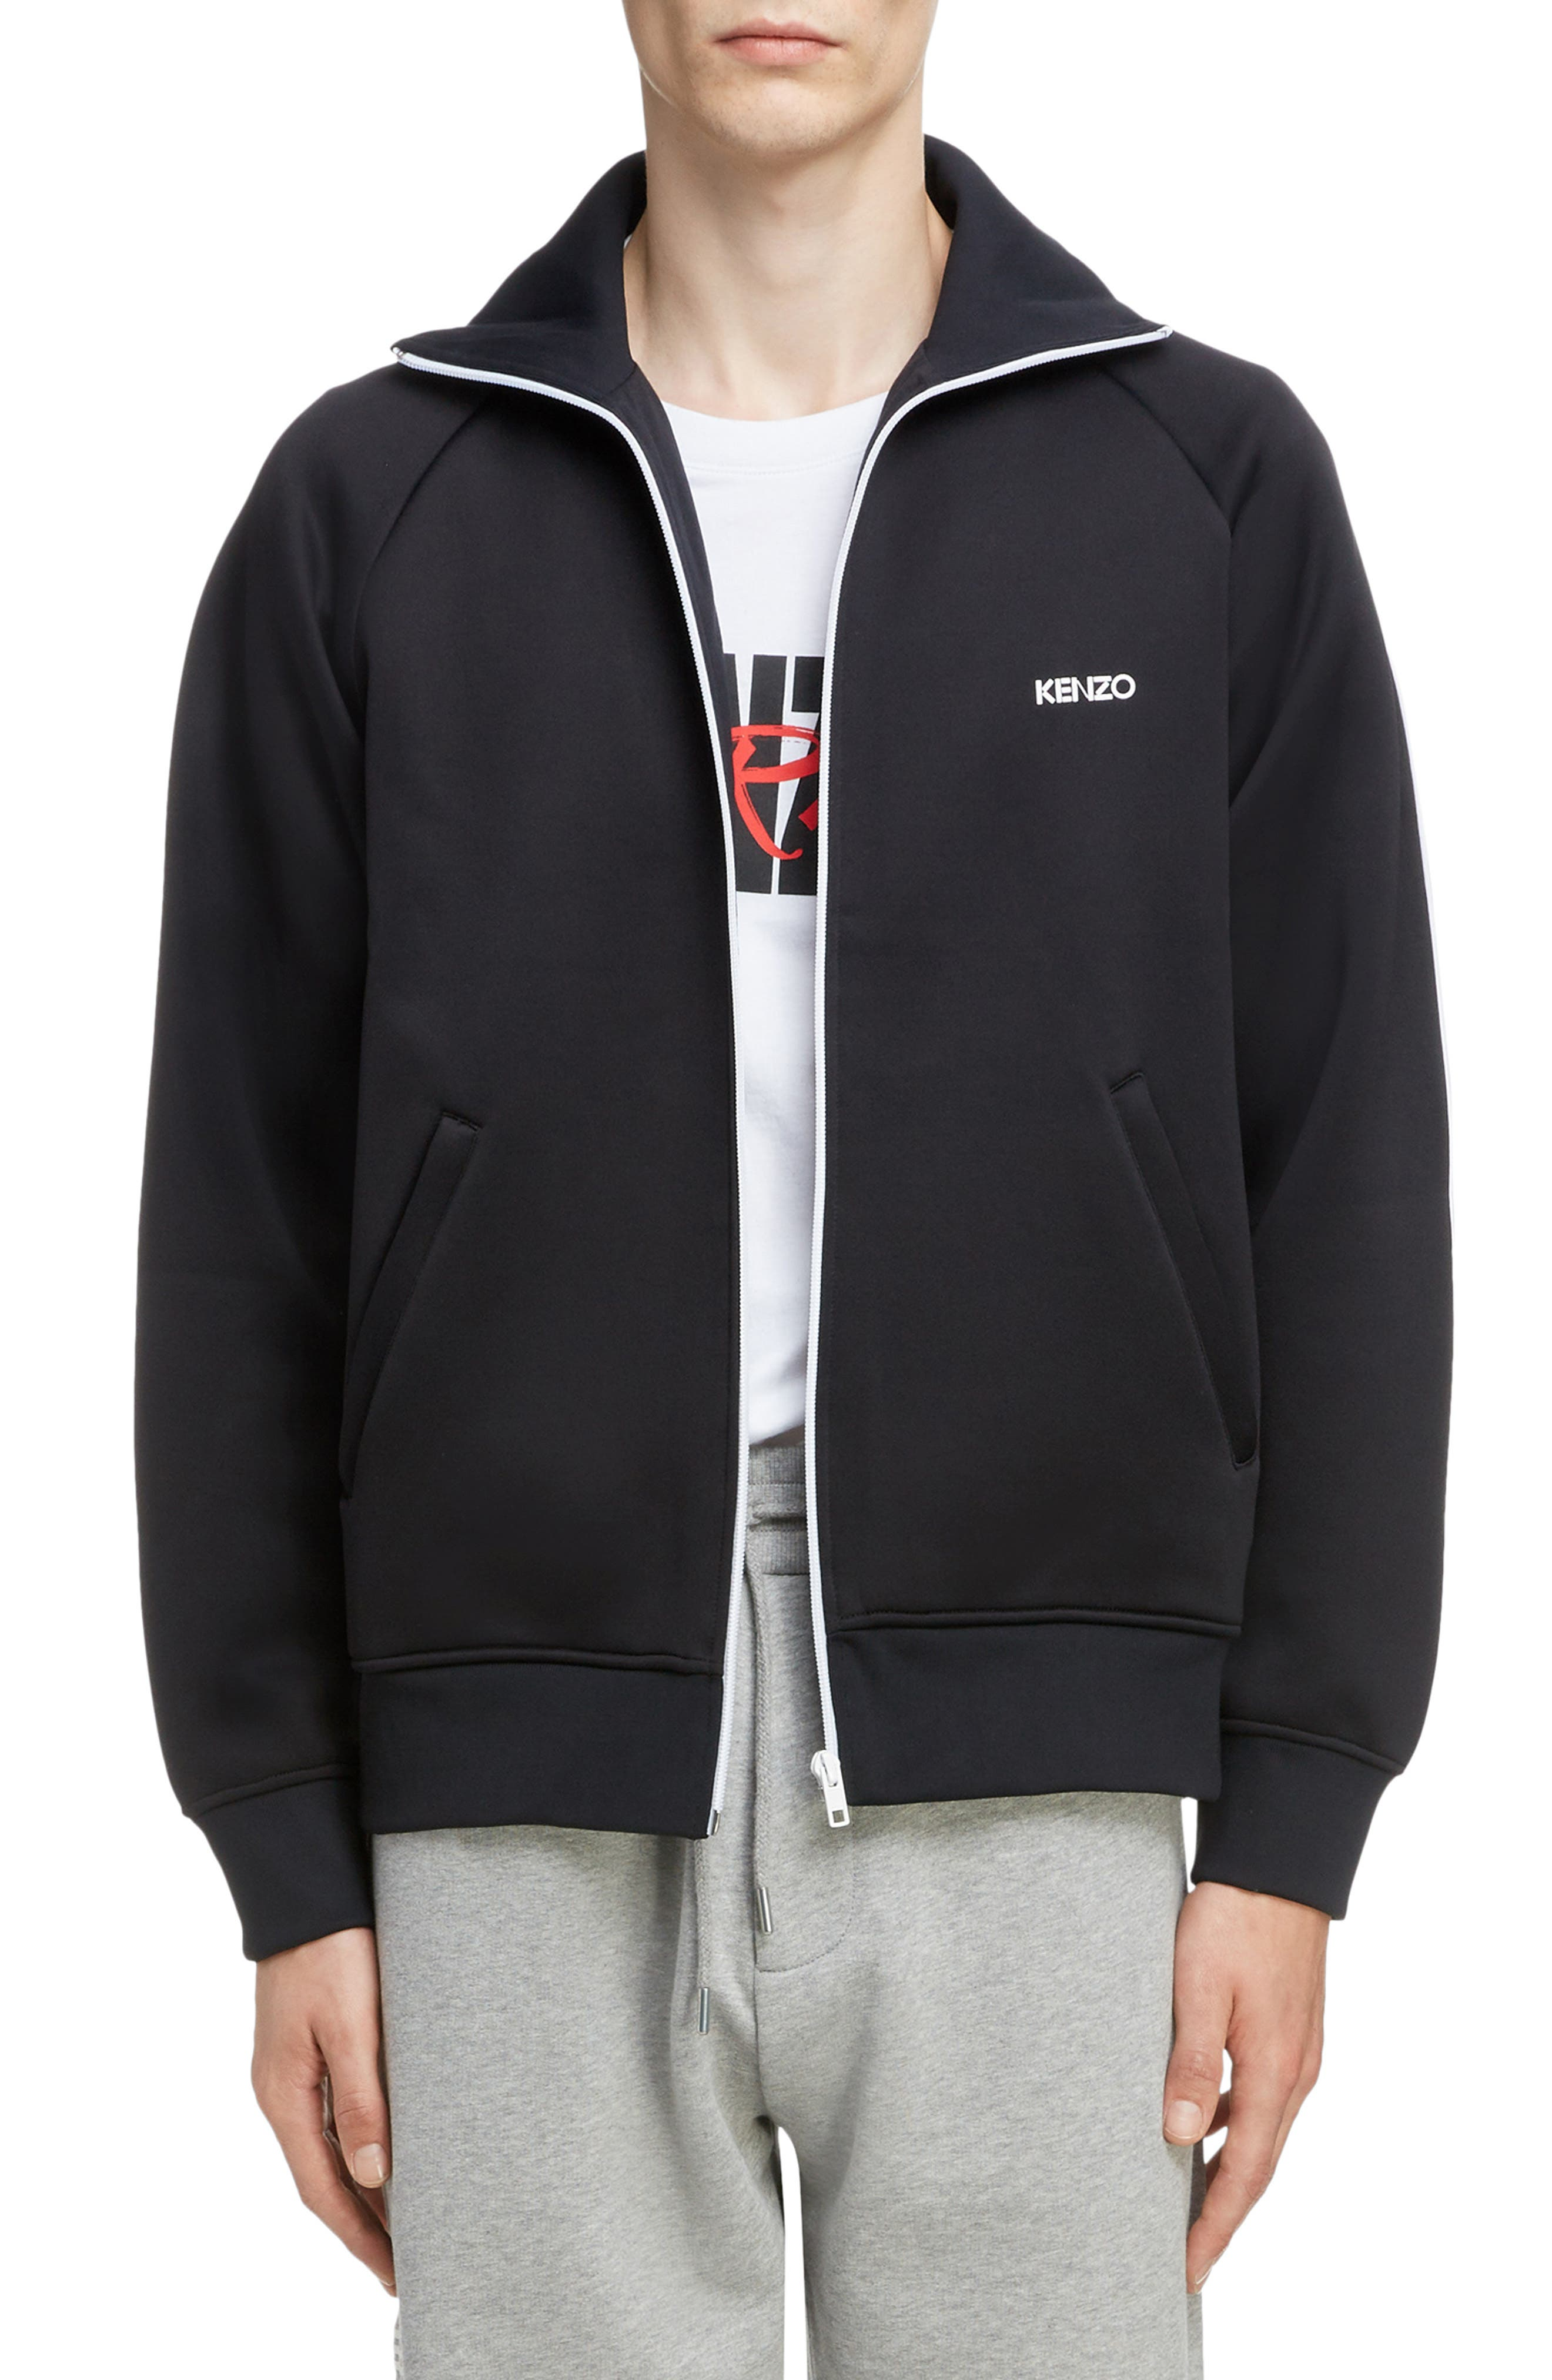 KENZO, Zip Track Jacket, Main thumbnail 1, color, BLACK